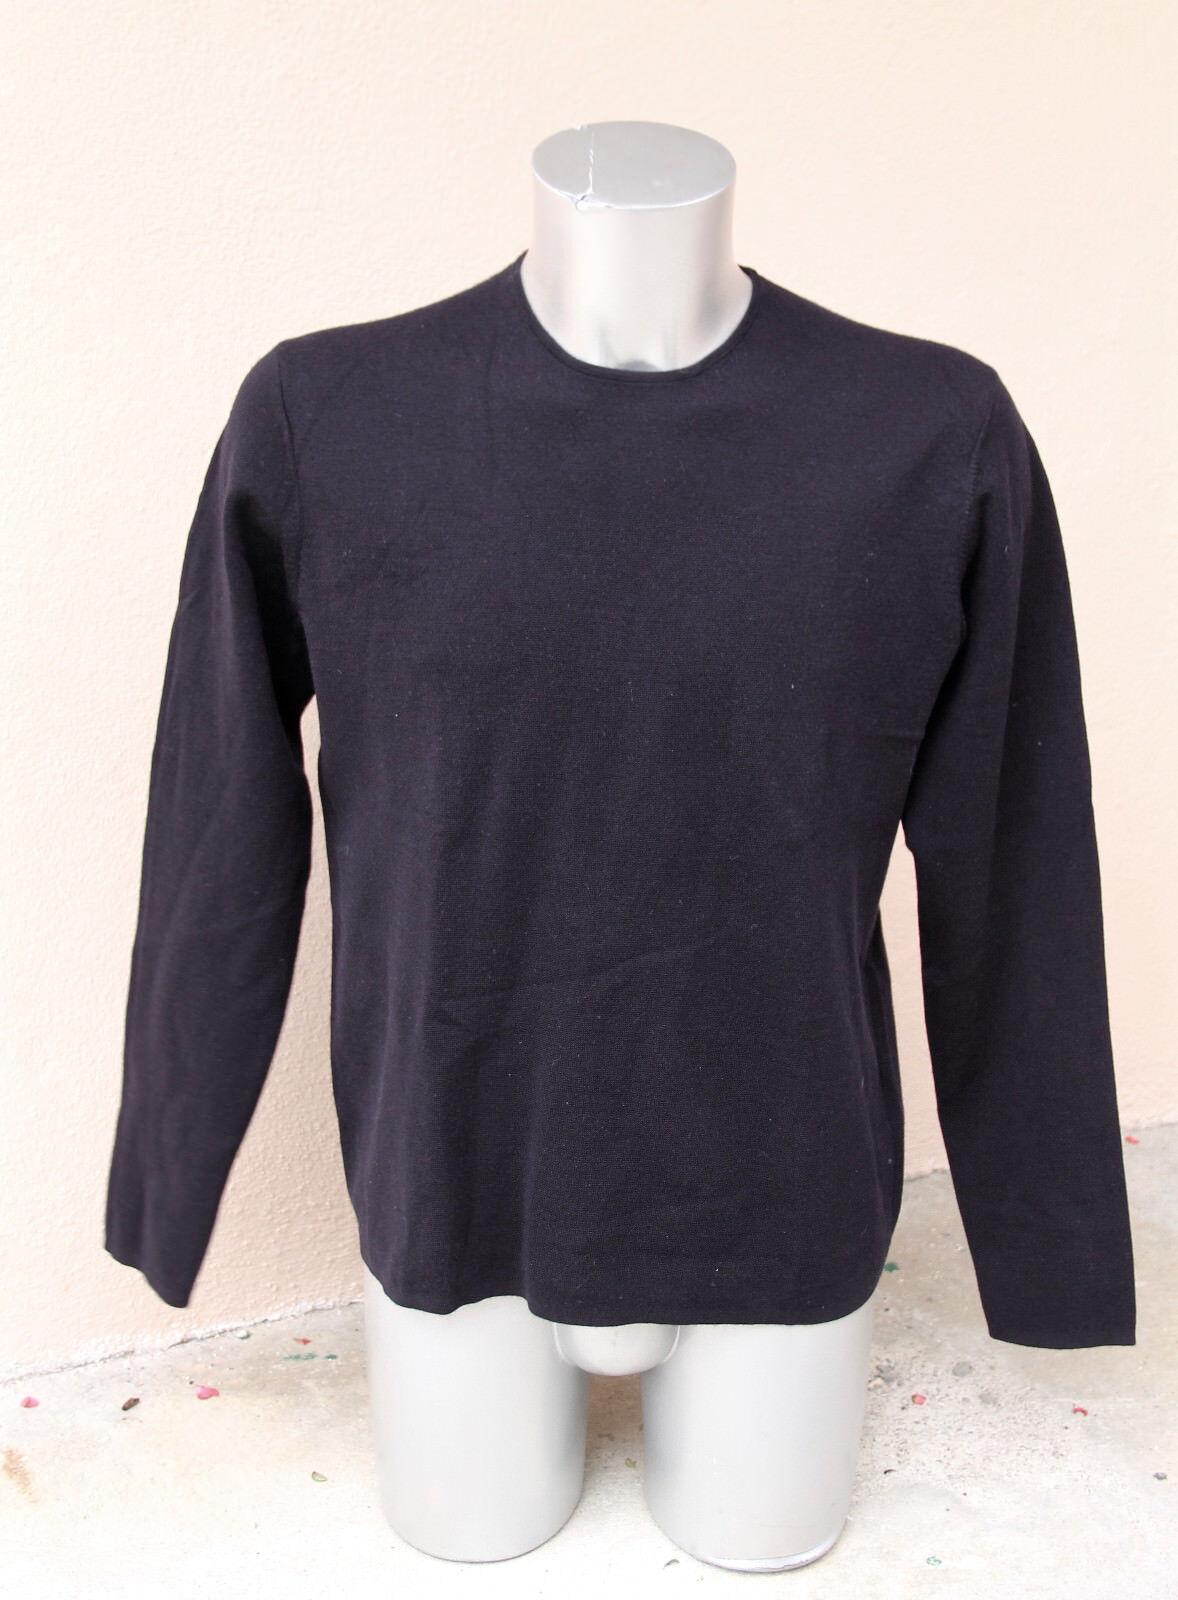 Lujoso suéter cuello ROTondo de lana elegante marina hombre COS talla L COMO